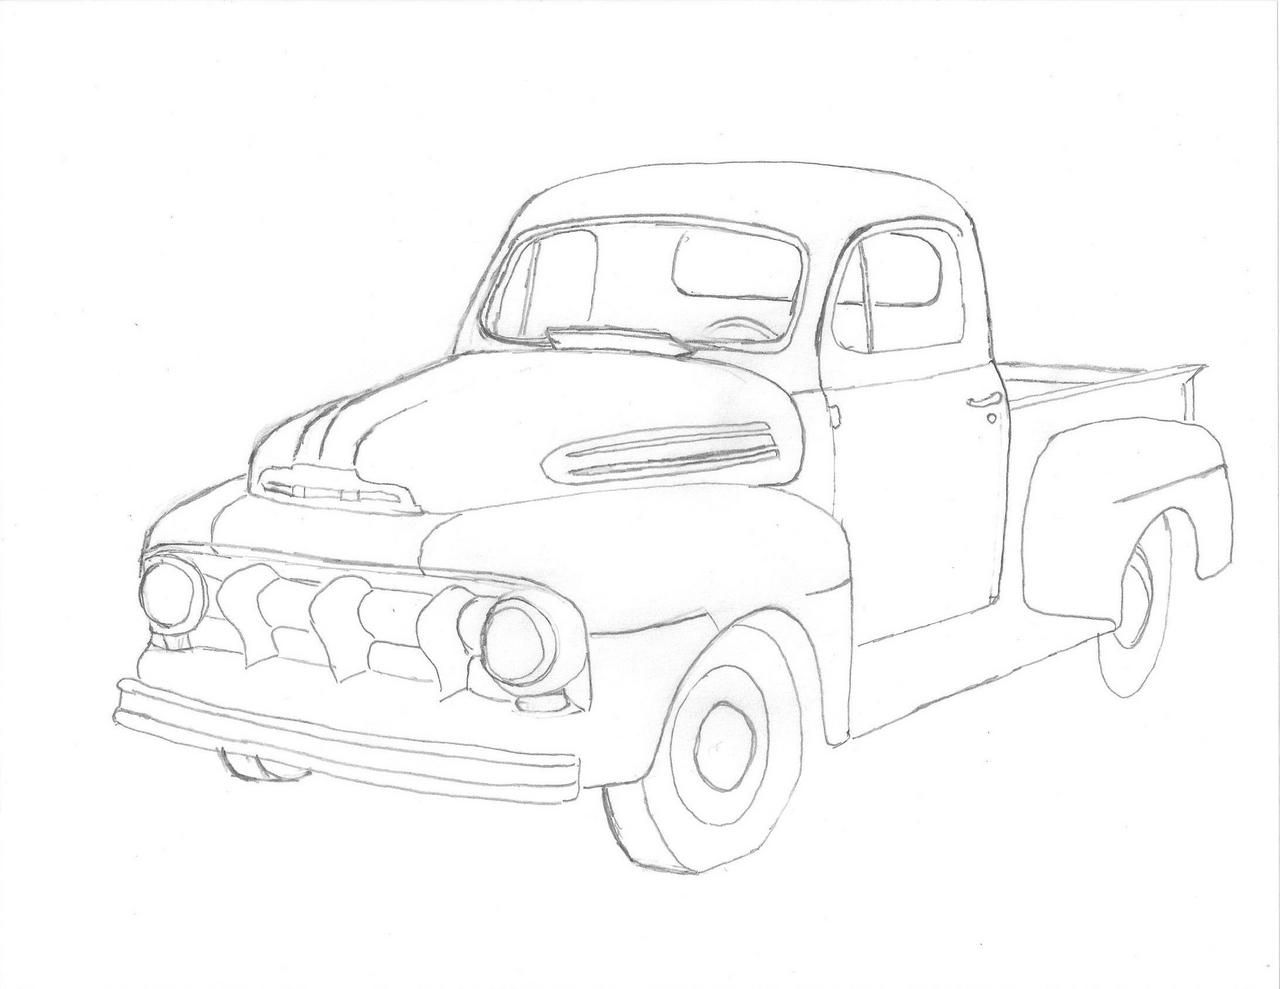 pickup drawing at getdrawings com